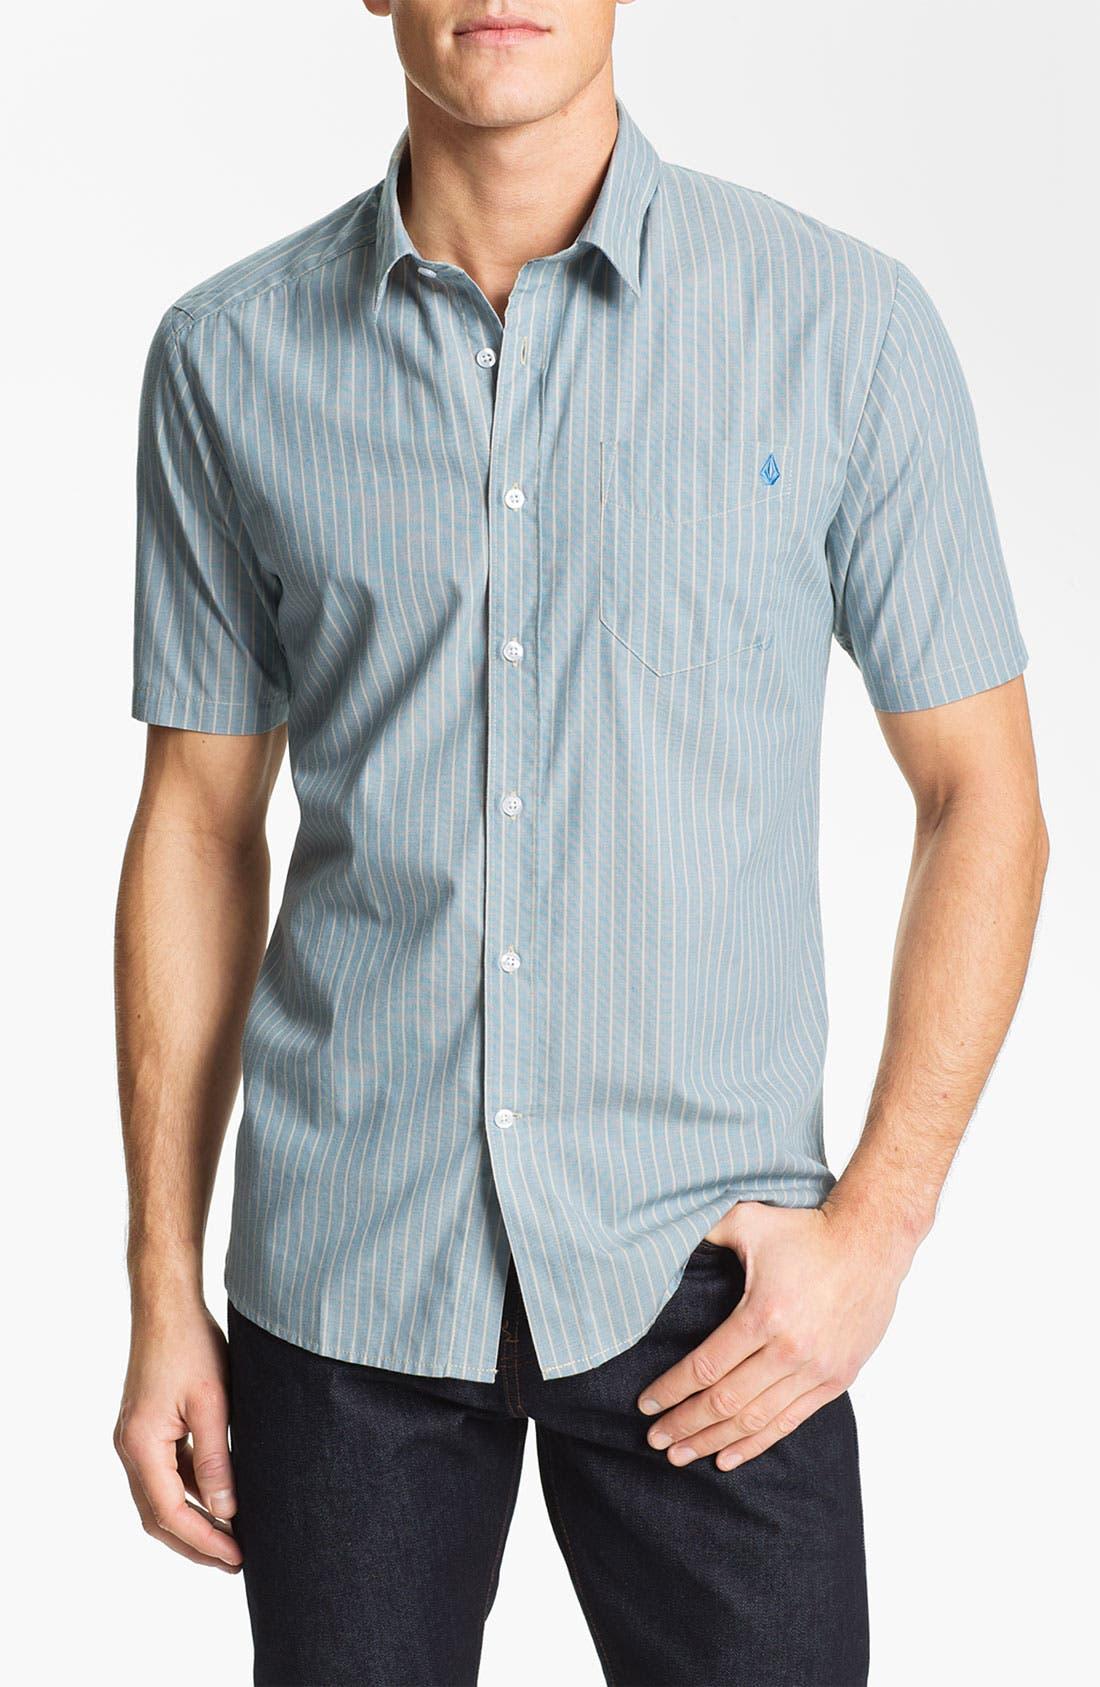 Main Image - Volcom 'Why Factor' Stripe Woven Shirt